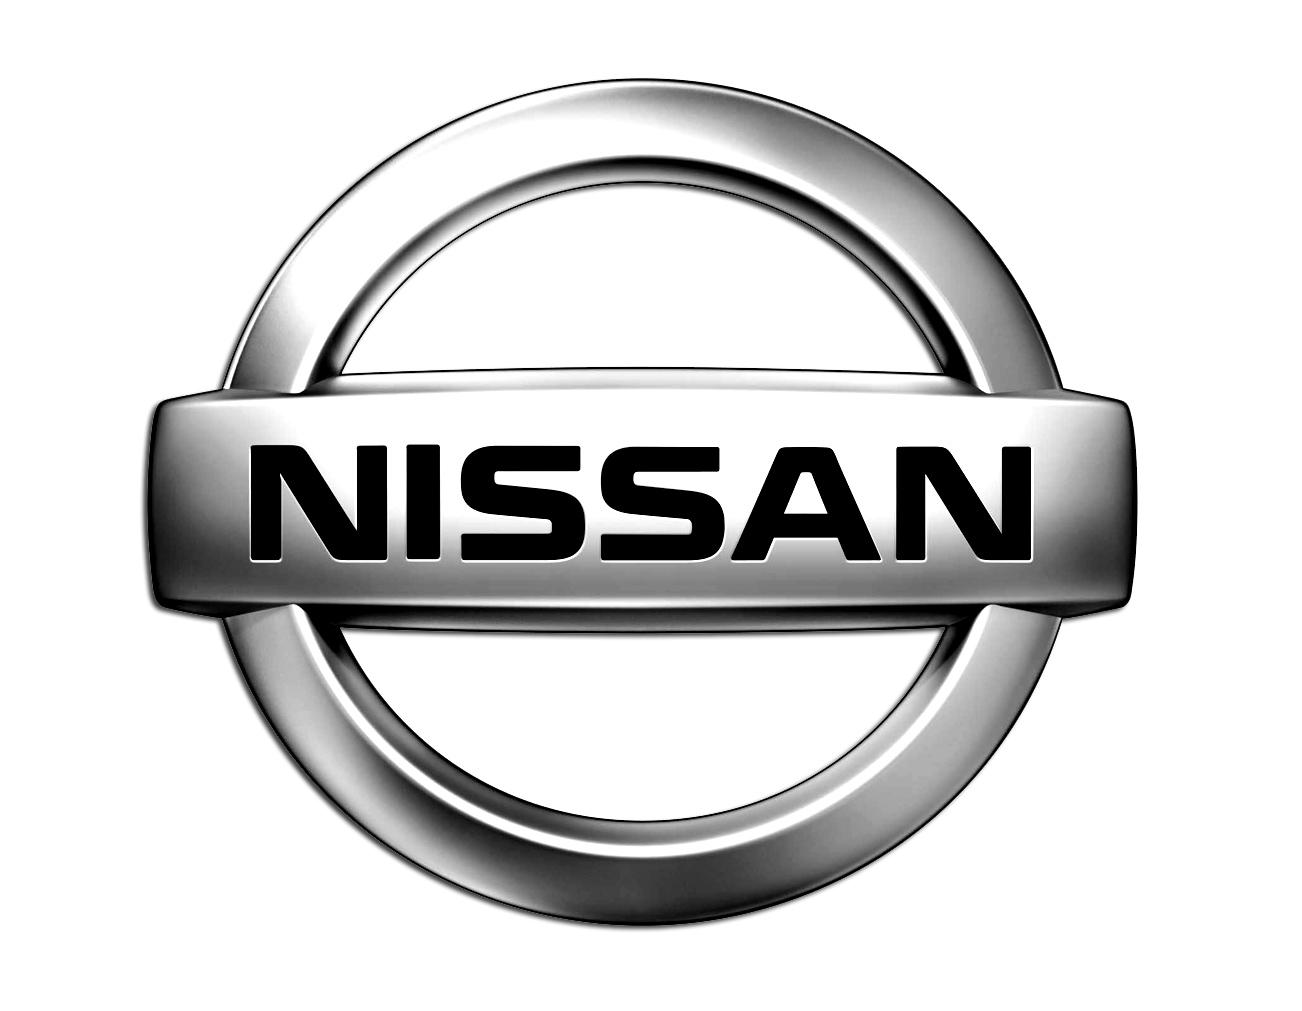 Large nissan car logo zero to 60 times nissan logo biocorpaavc